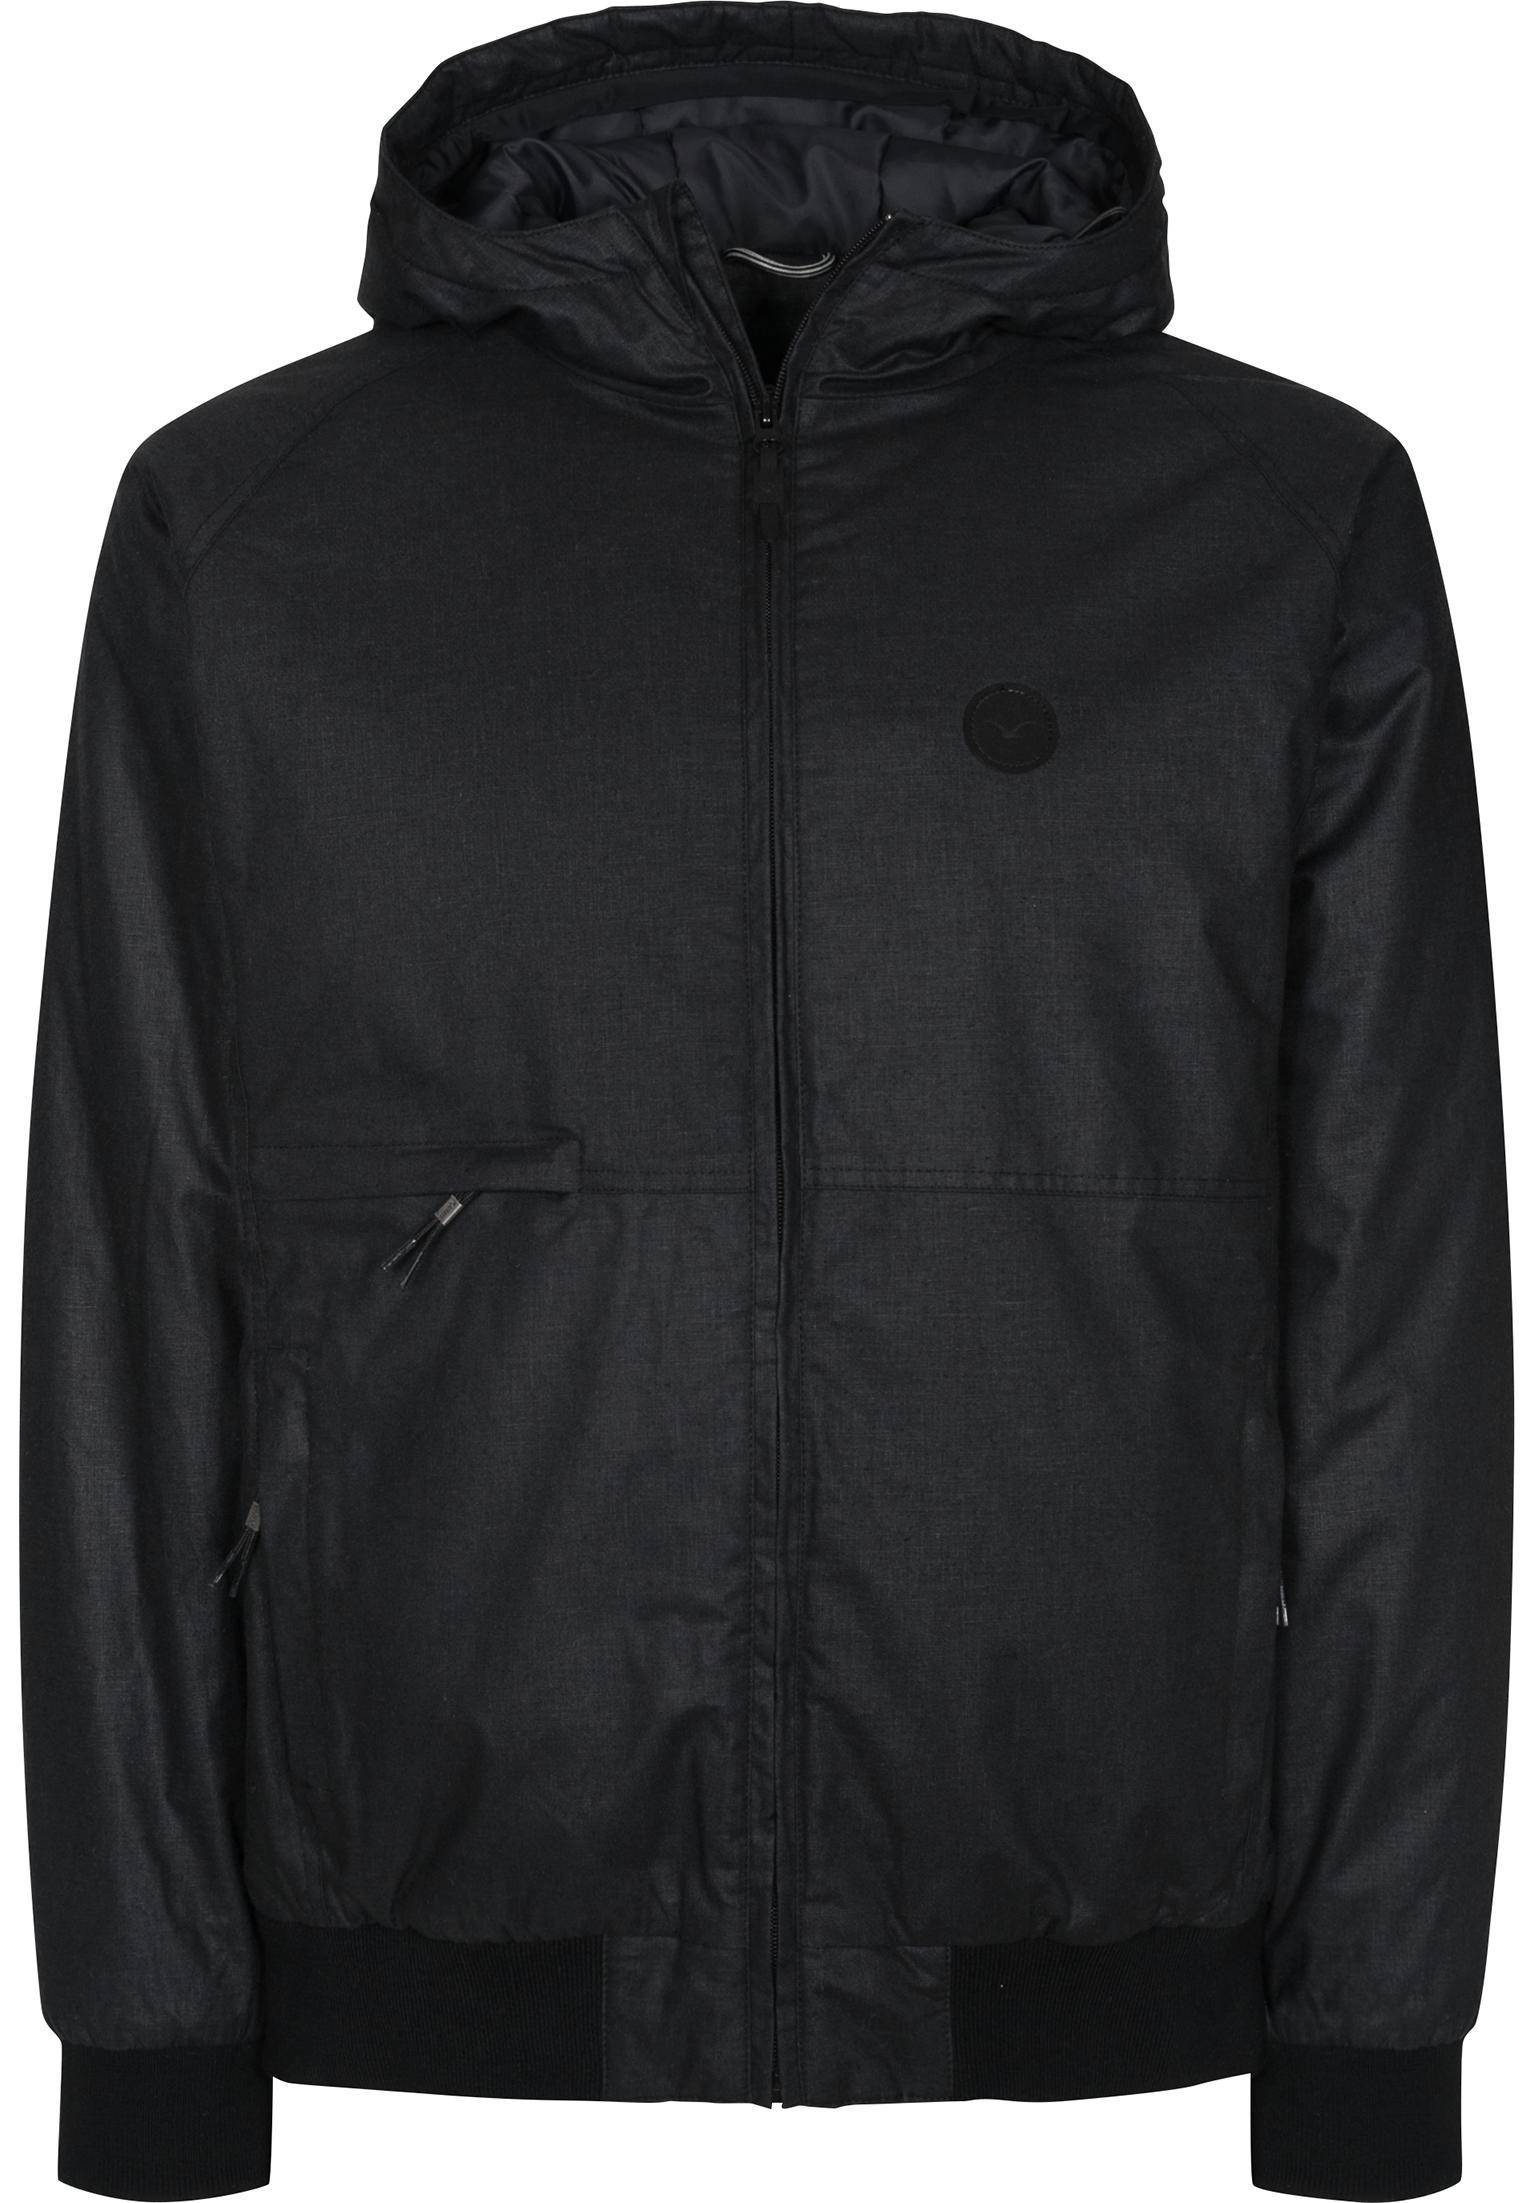 Polarzipper Hemp Cleptomanicx Winter Jackets in black for